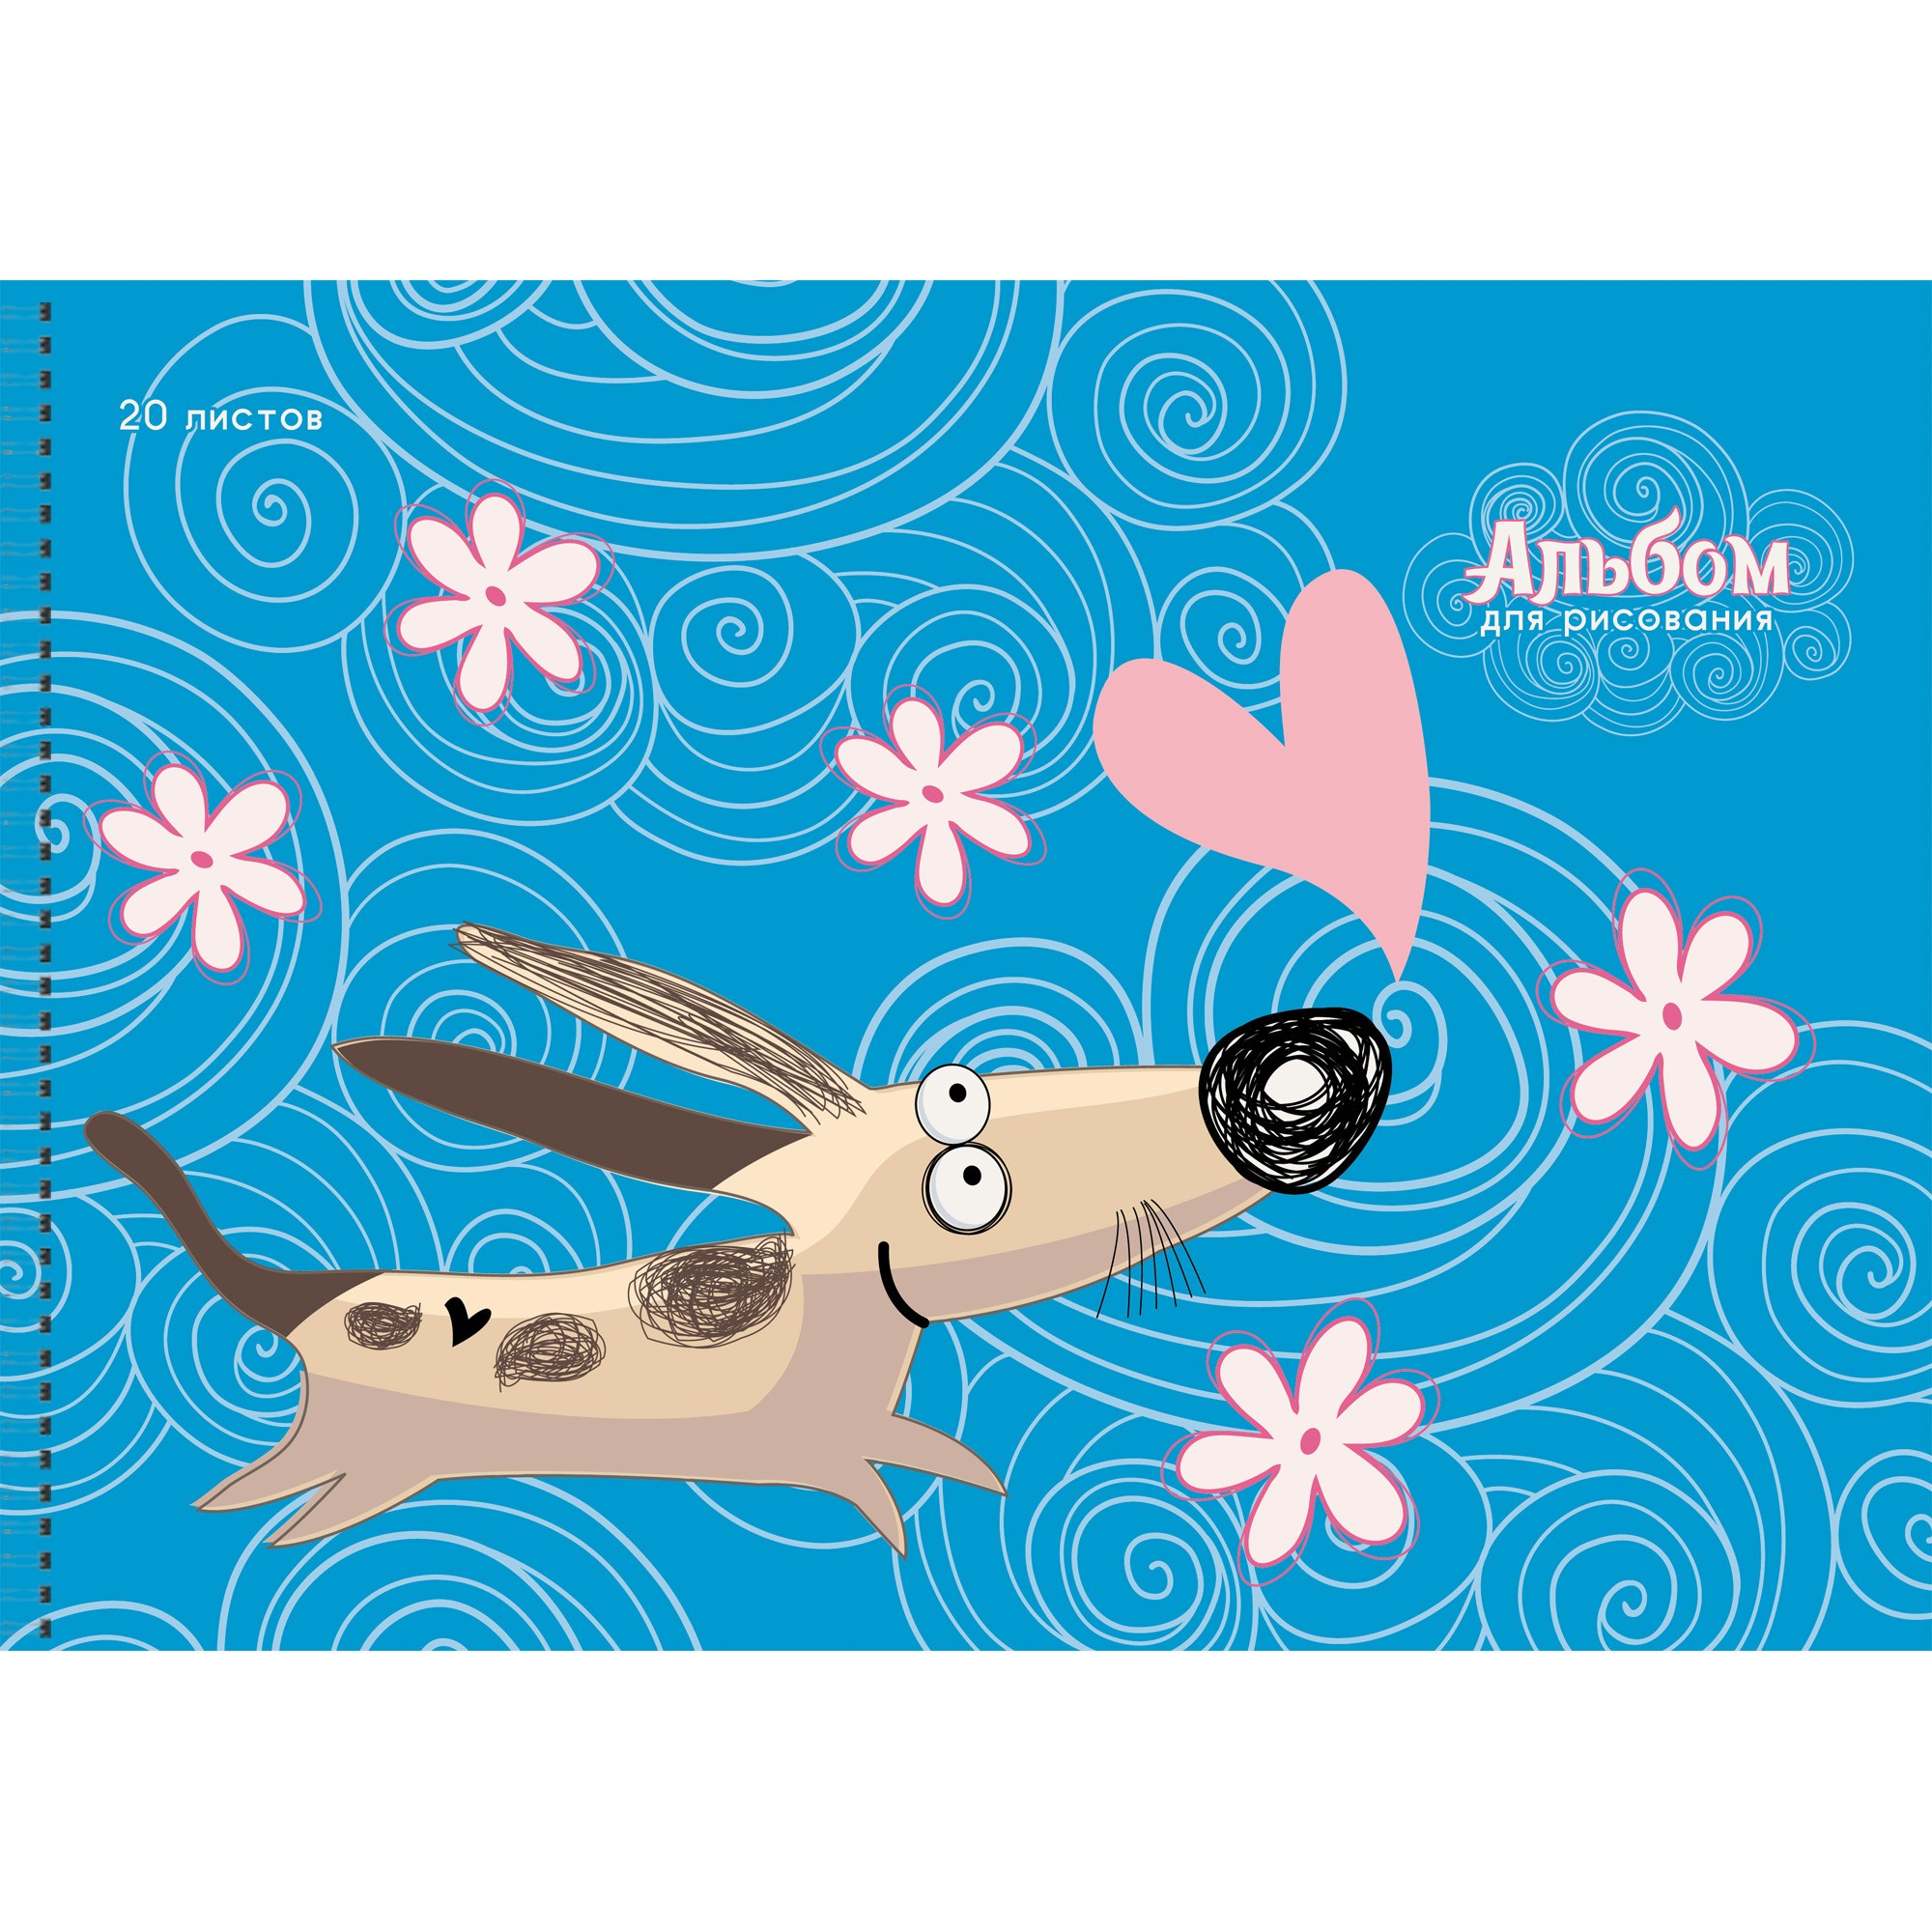 Альбом для рисования Unnika Land Собака-улыбака (20л 110 г/м Евроспираль) АС201896